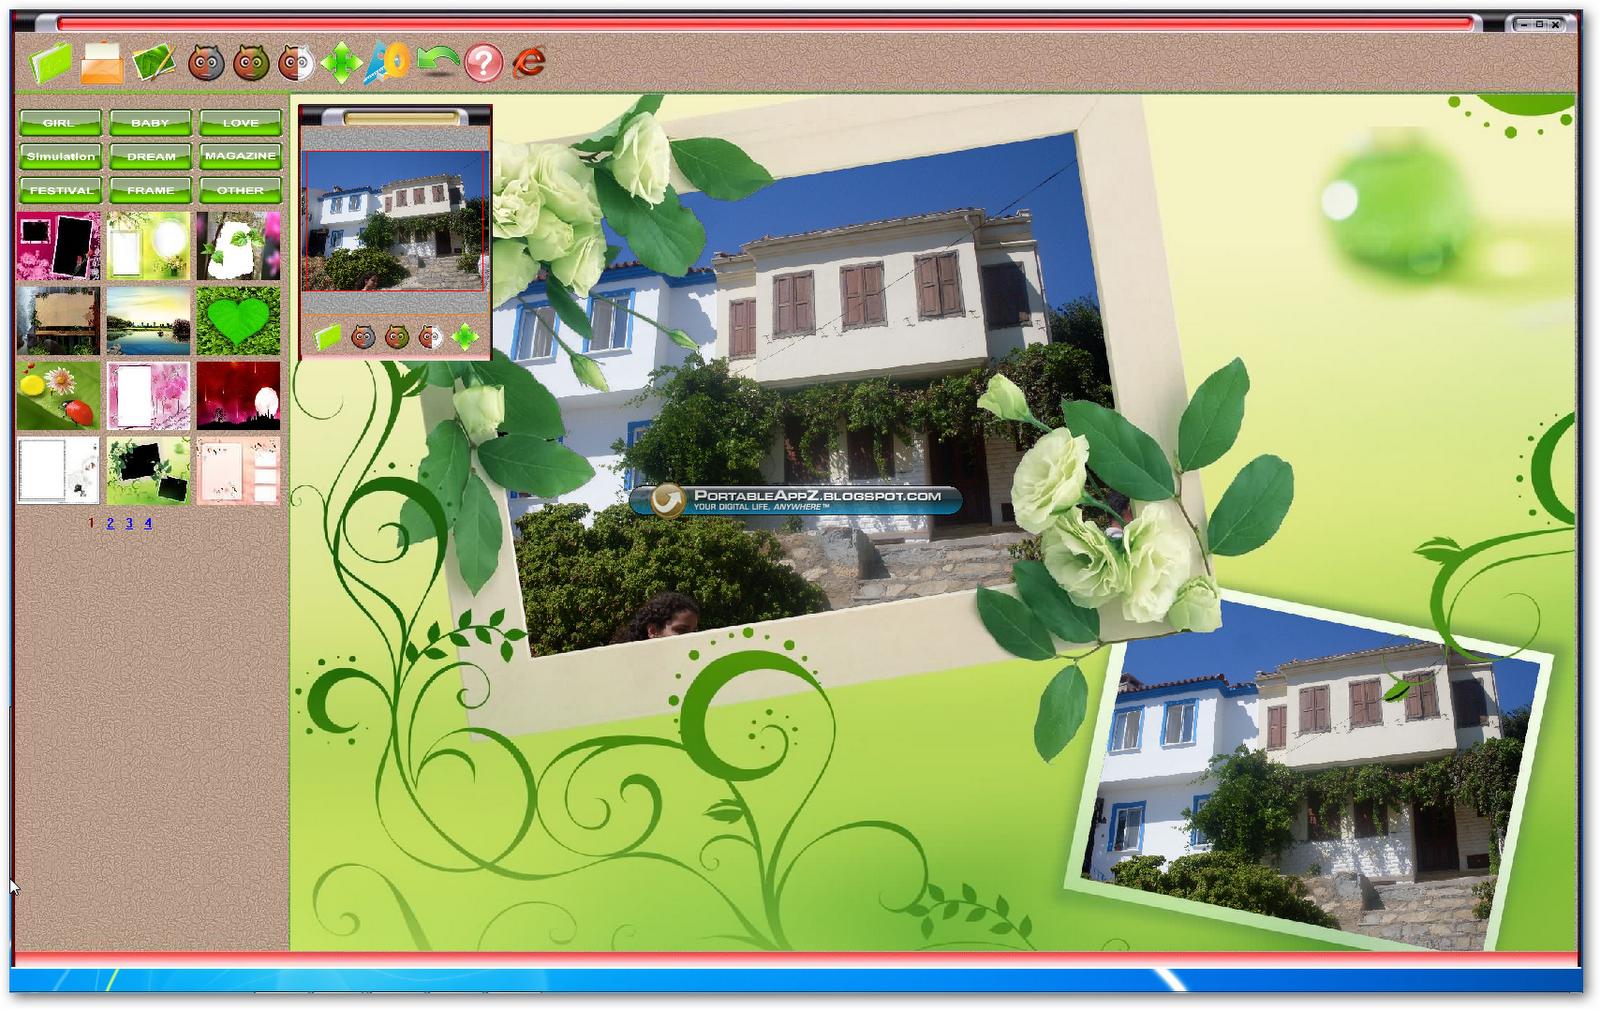 Free photoshine full version download with crack SERIAL NUMBER DAN PRODUCT KEY KUMPULAN PRODUCT KEY